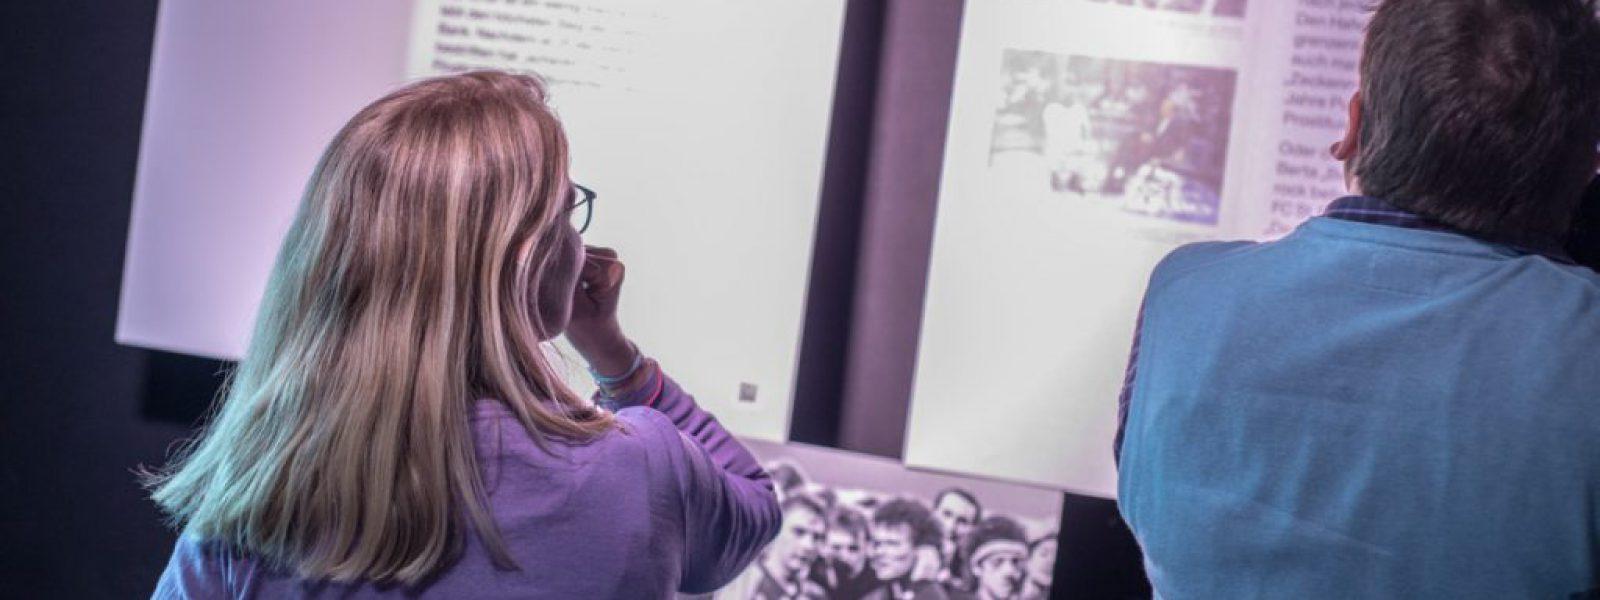 LNDM 2019 FCSPMuseum (Sabrina A Nagel) - 22